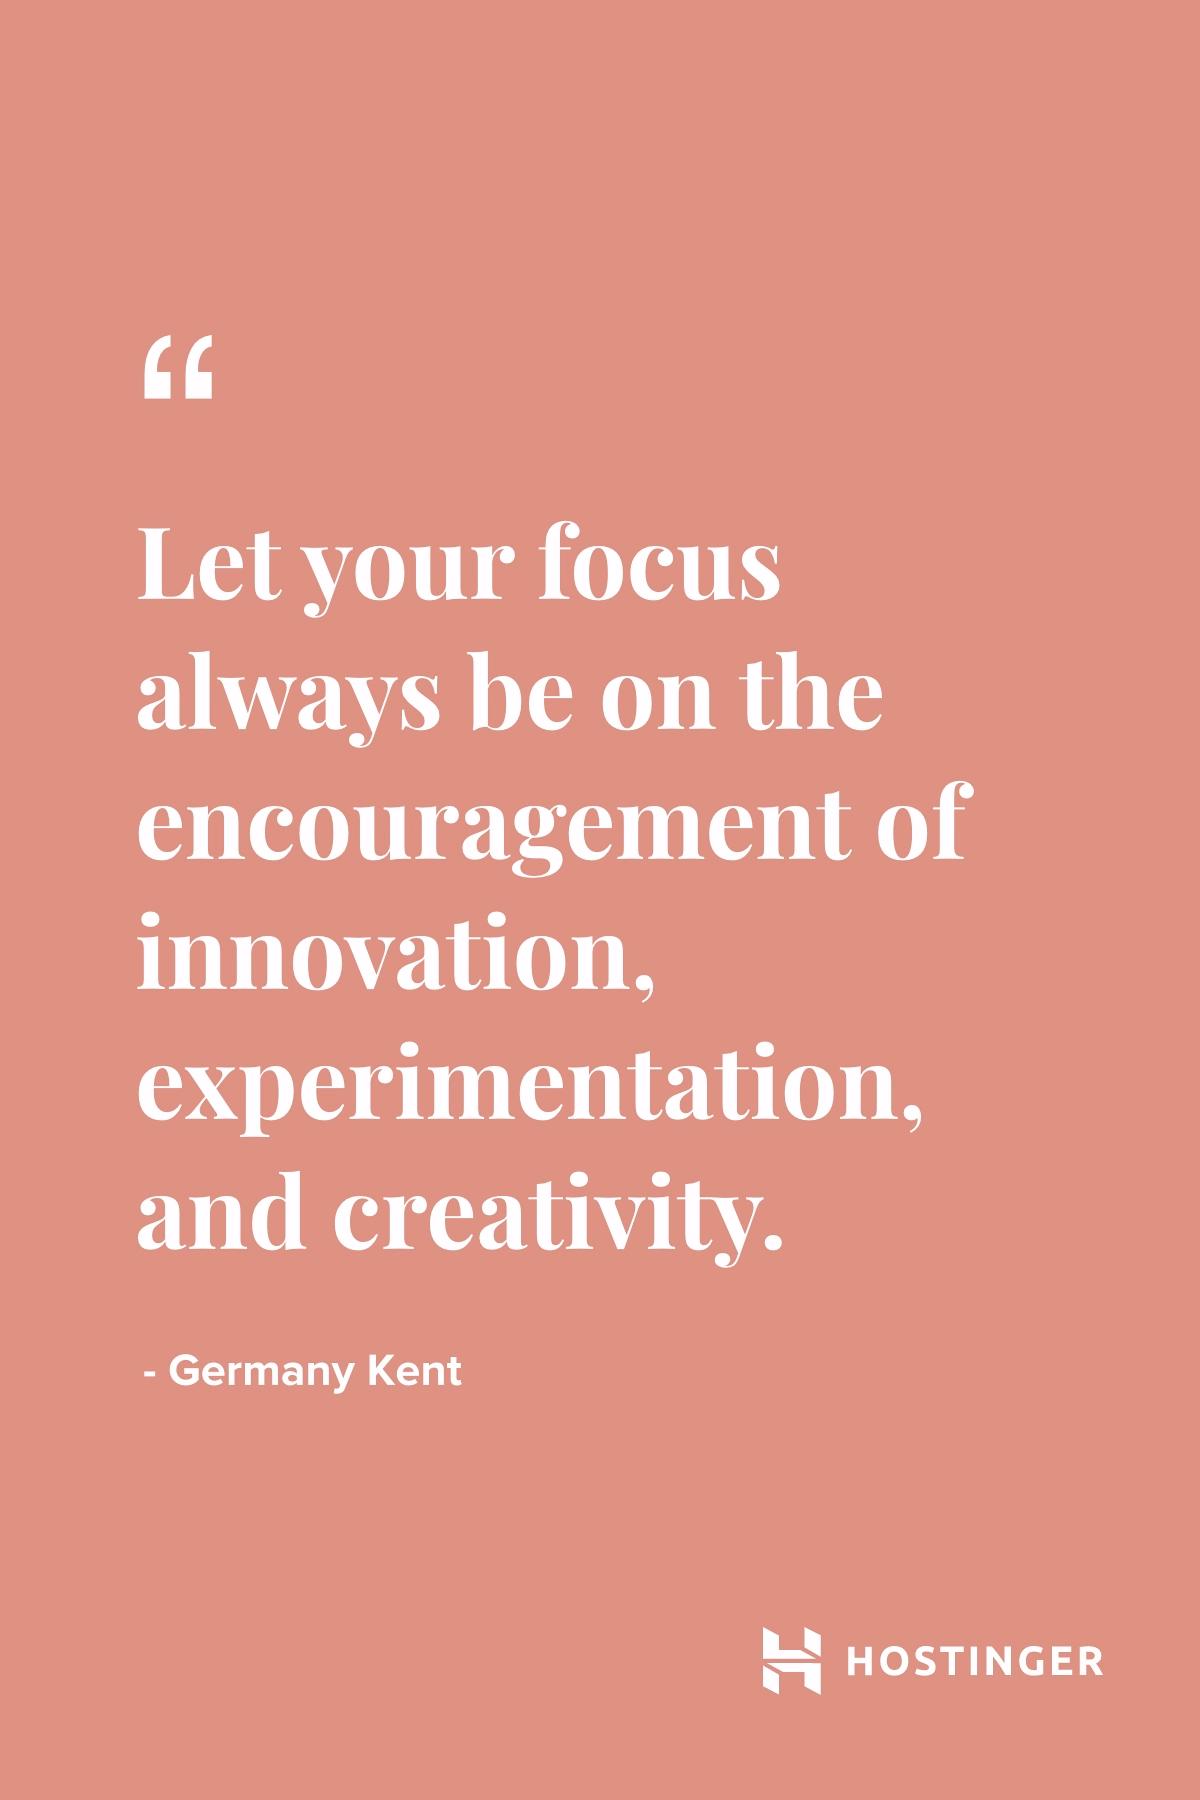 Quotes | Hostinger | Creativity | Germany Kent